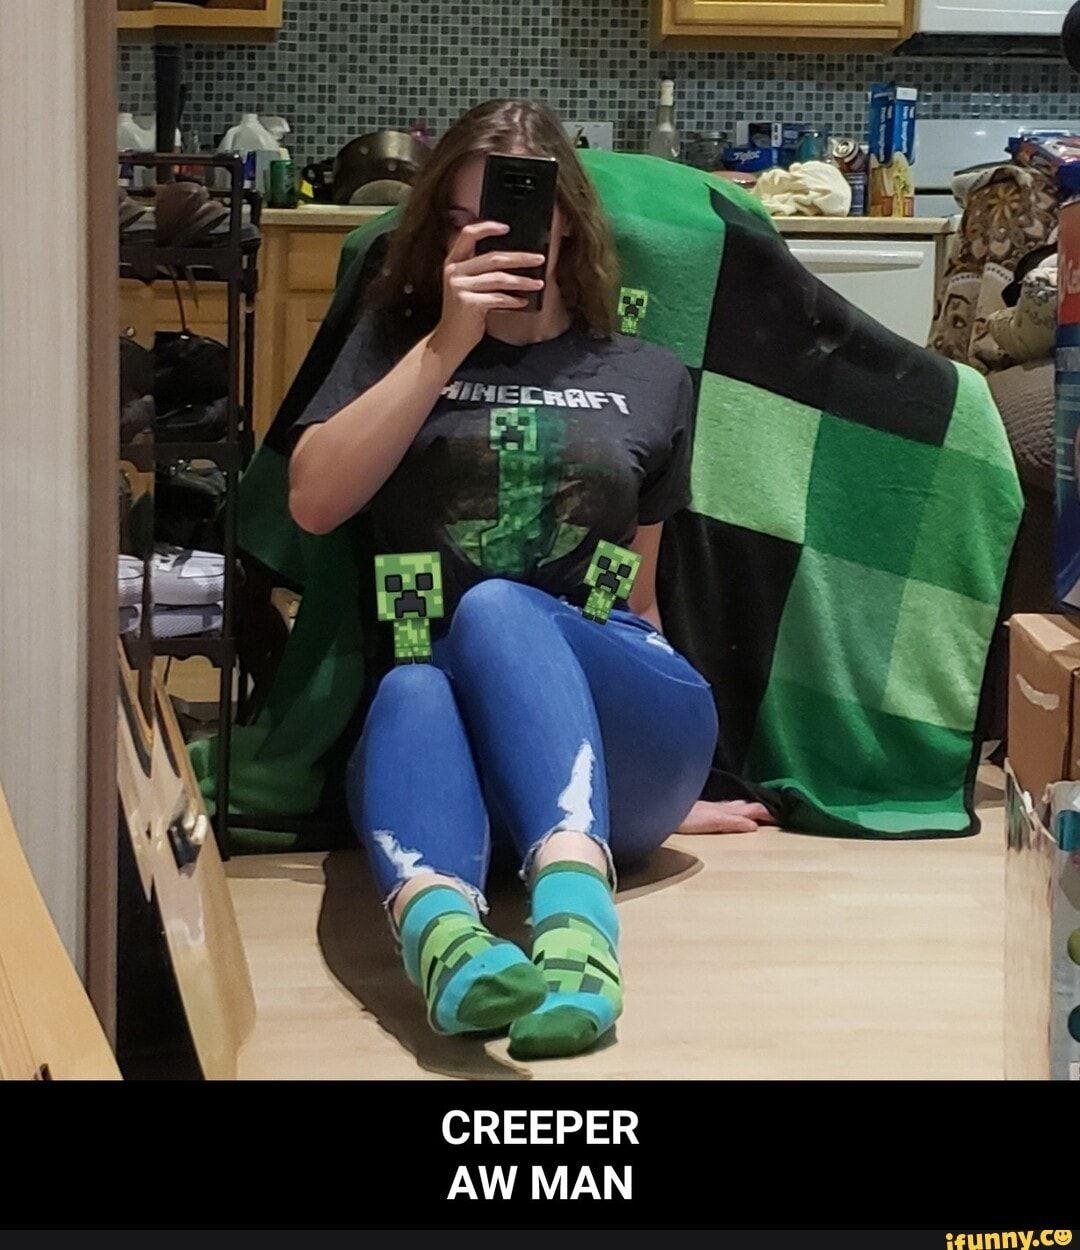 CREEPER AW MAN - CREEPER AW MAN - iFunny :)   Funny cute ...